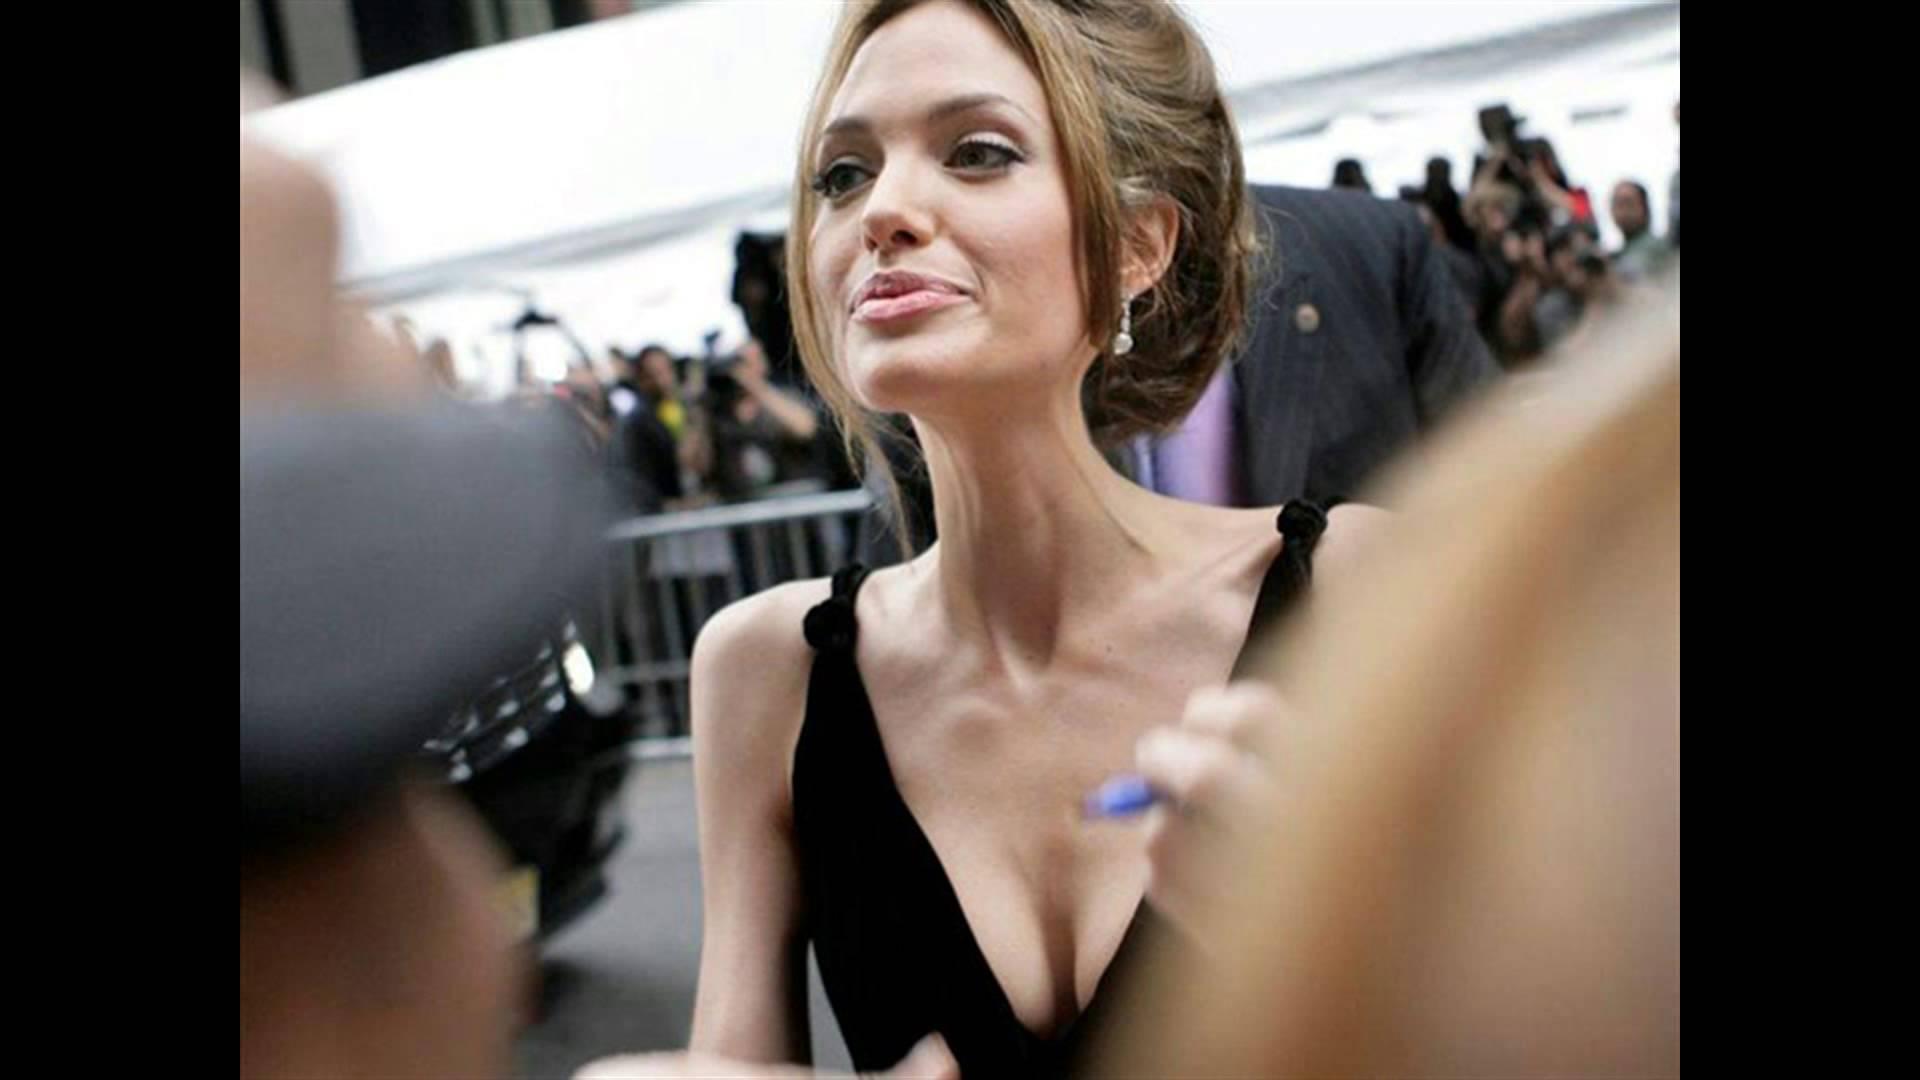 СМИ раскрыли тайну анорексичного вида Анджелины Джоли